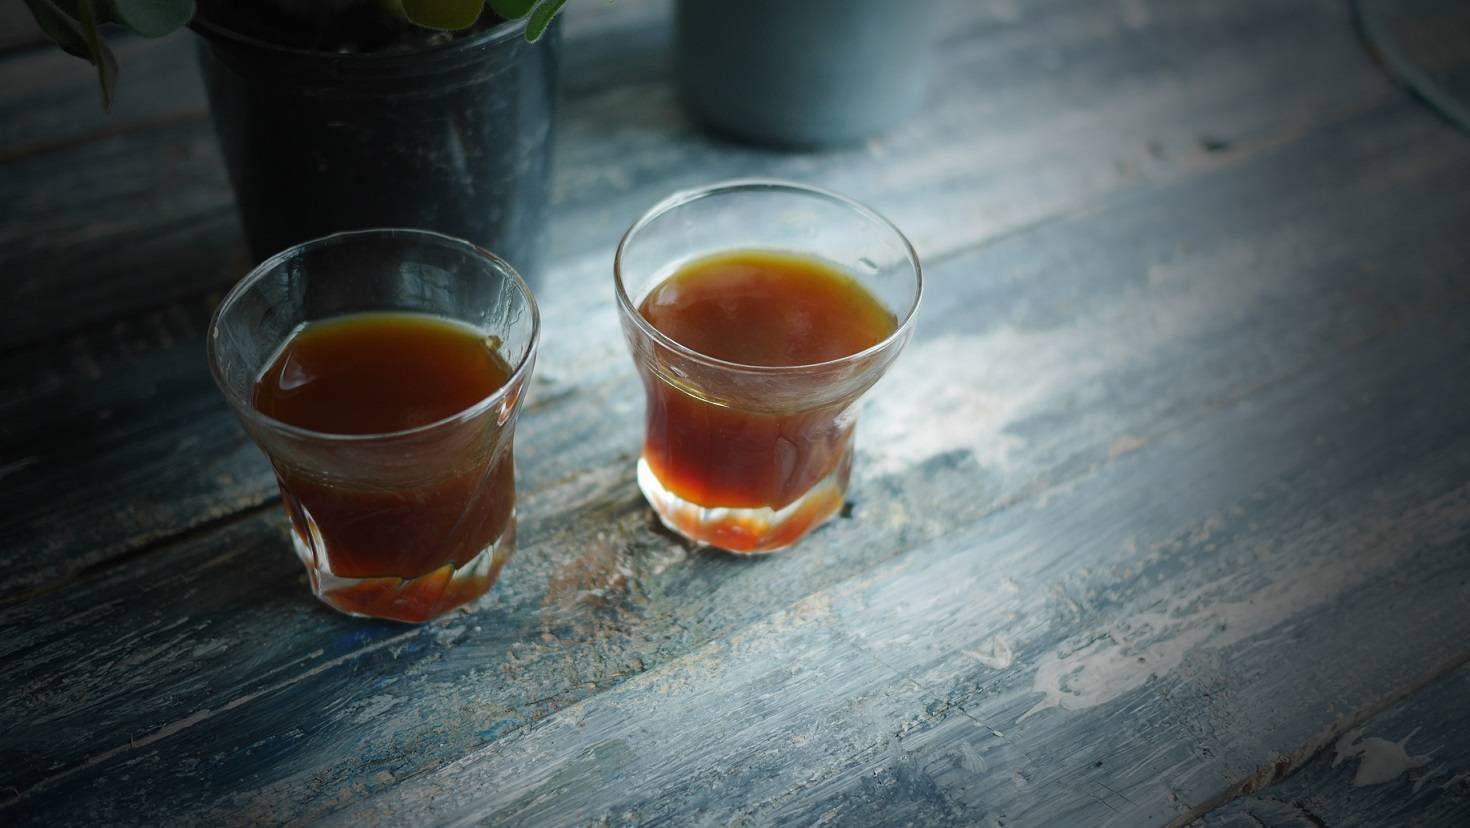 Настойка на сухофруктах на самогоне: 3 быстрых и вкусных рецепта